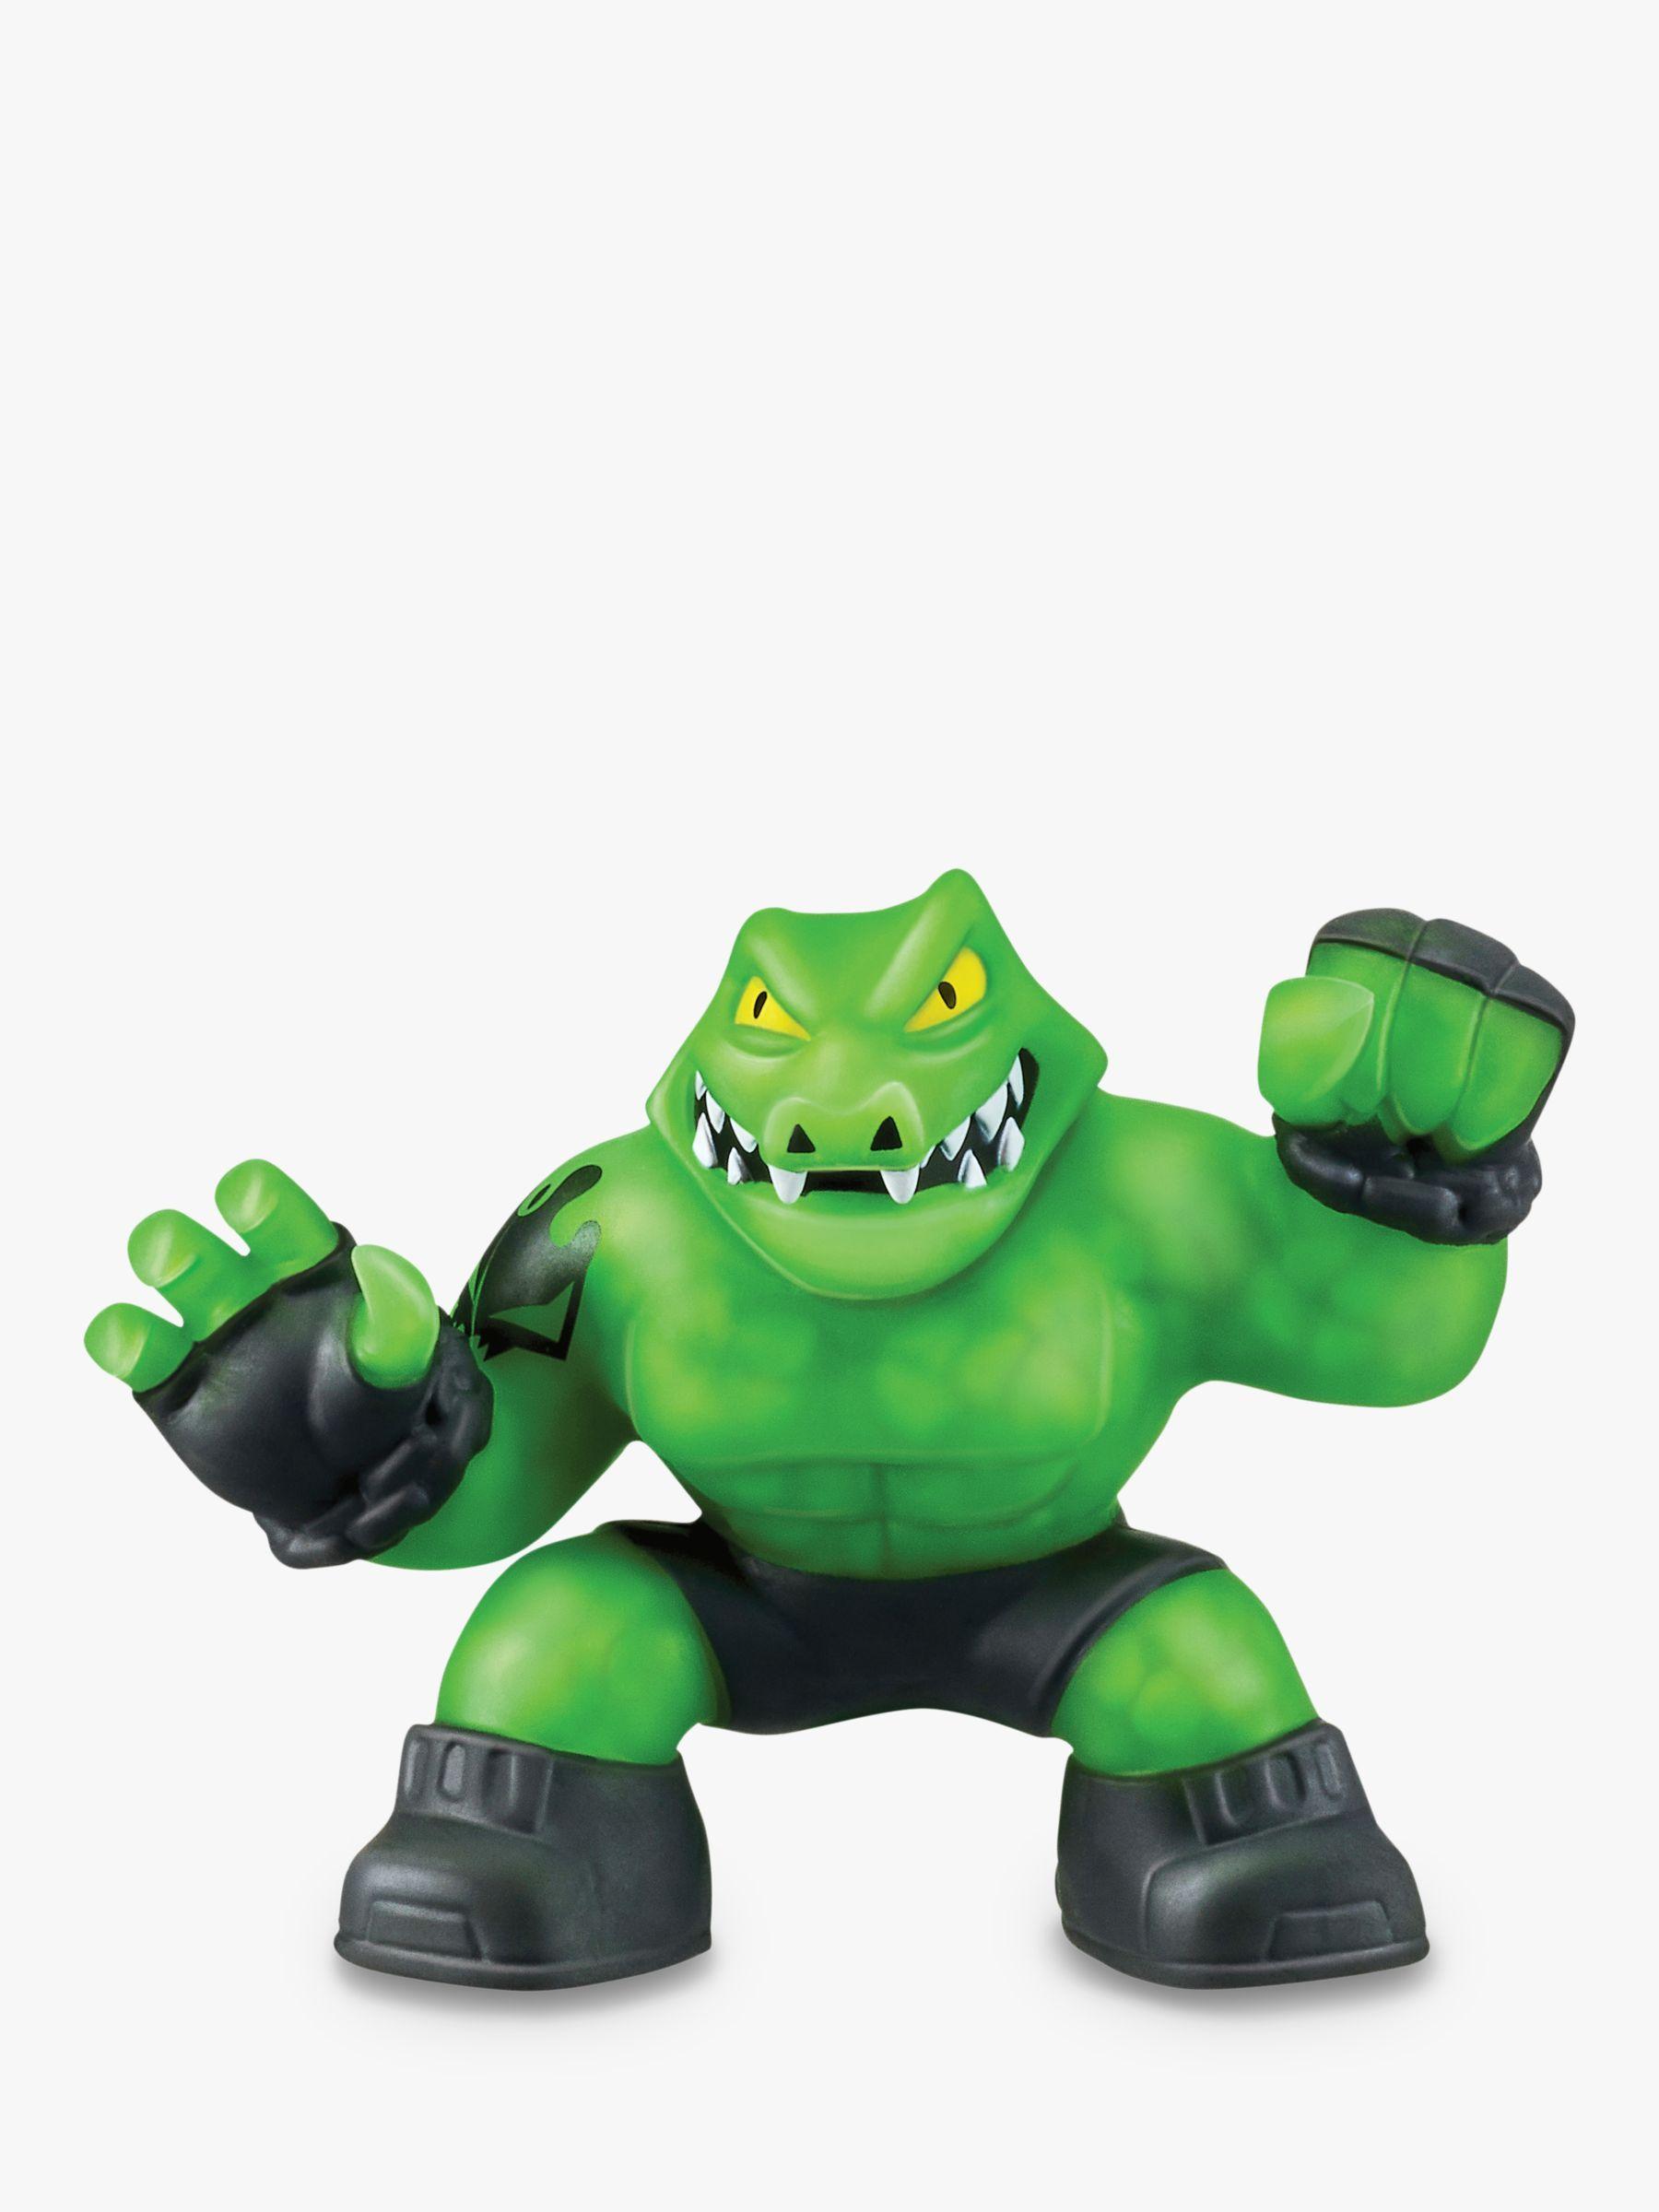 Heroes Of Goo Jit Zu Thrash And Rock Jaw Versus Squishy Action Figures Action Figures Cool Lego Creations Bakugan Battle Brawlers